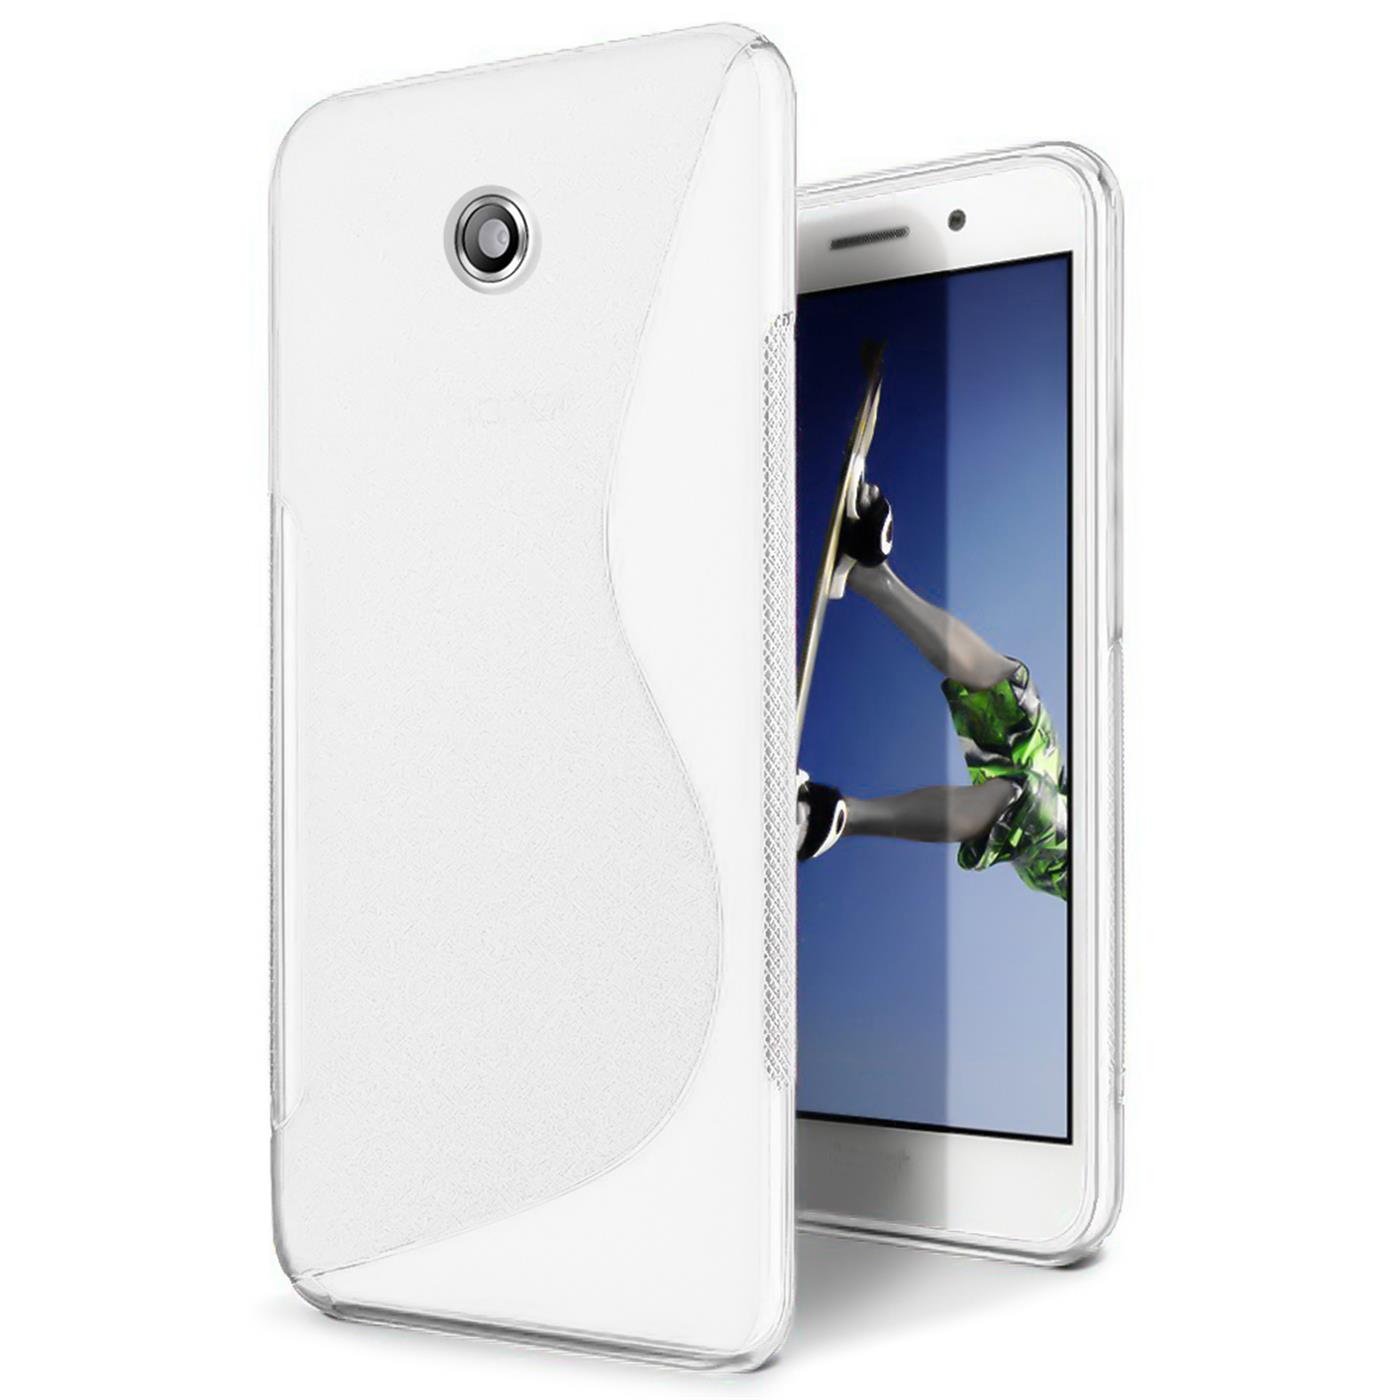 Handy-Huelle-Huawei-Y330-Silikon-Case-Ultra-Slim-Cover-Schutz-Huelle-Tasche-Weiss